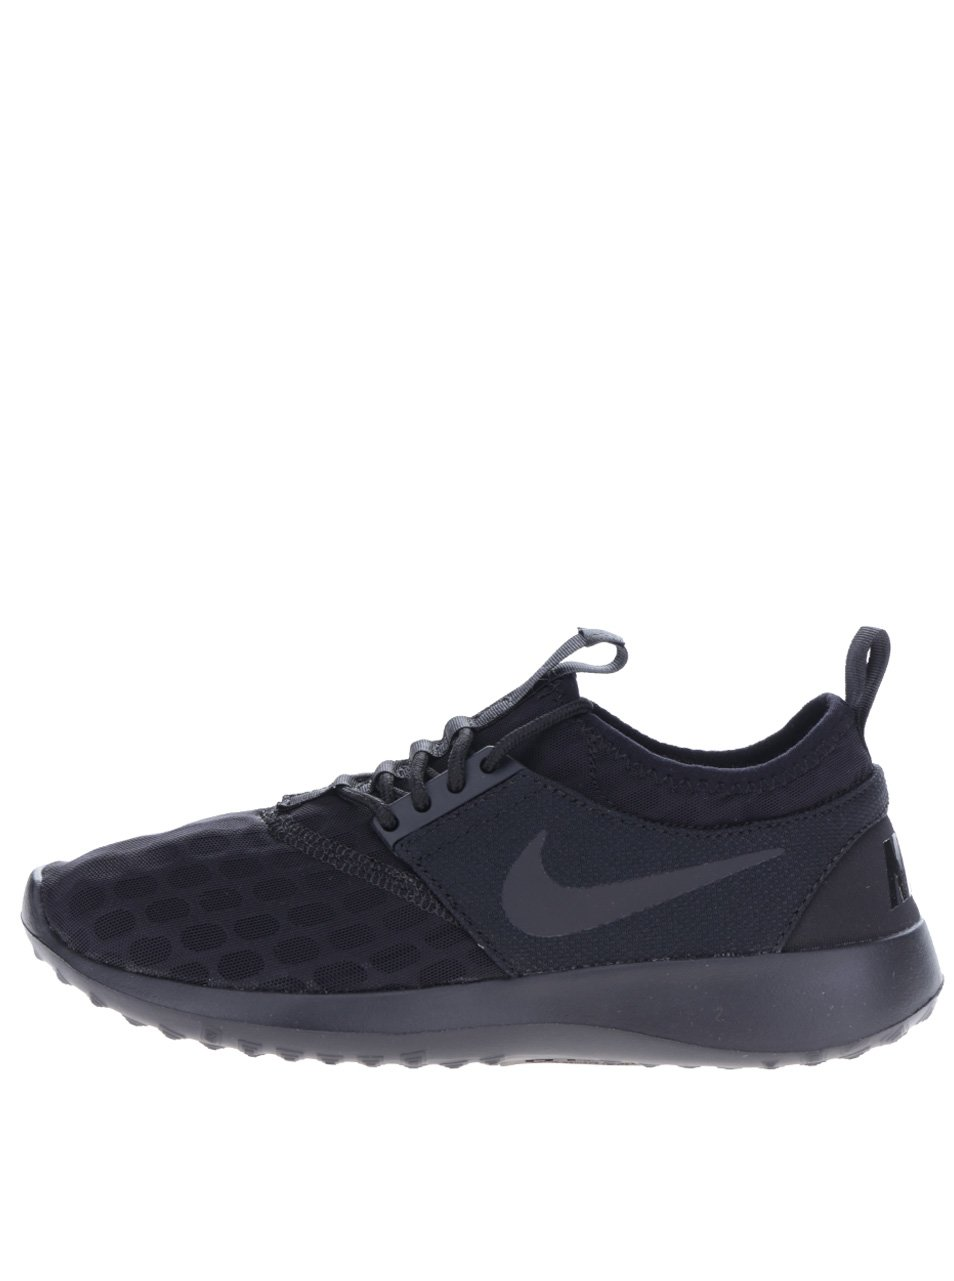 ec90aa463 Čierne dámske tenisky Nike Juvenate | Moda.sk